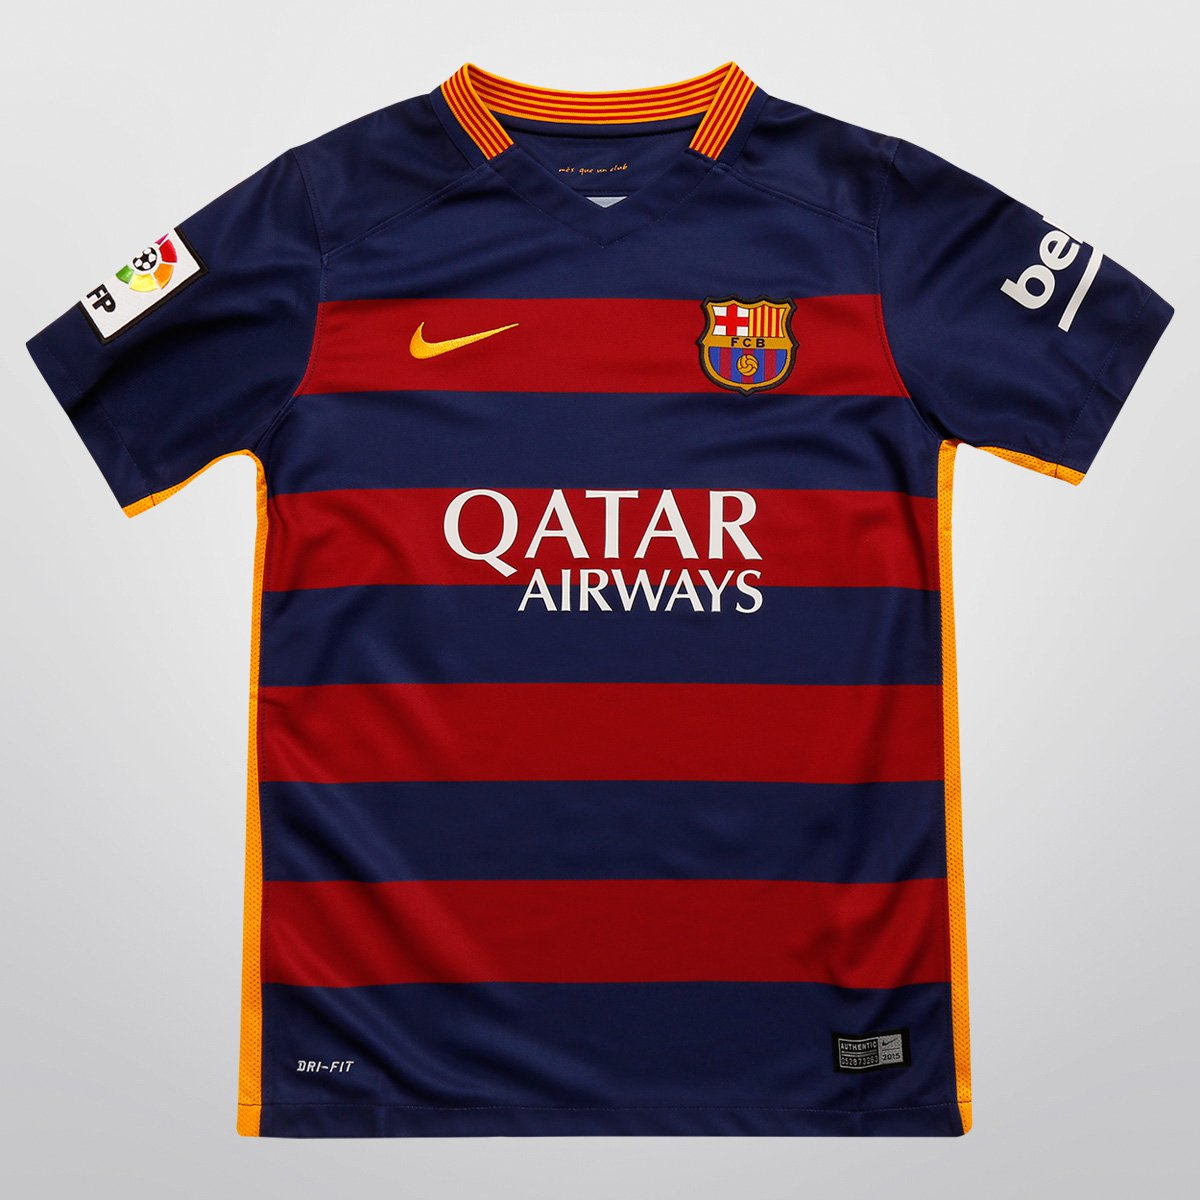 aad9fda8a8 Camisa Nike Barcelona Home 15 16 s nº Juvenil - Compre Agora